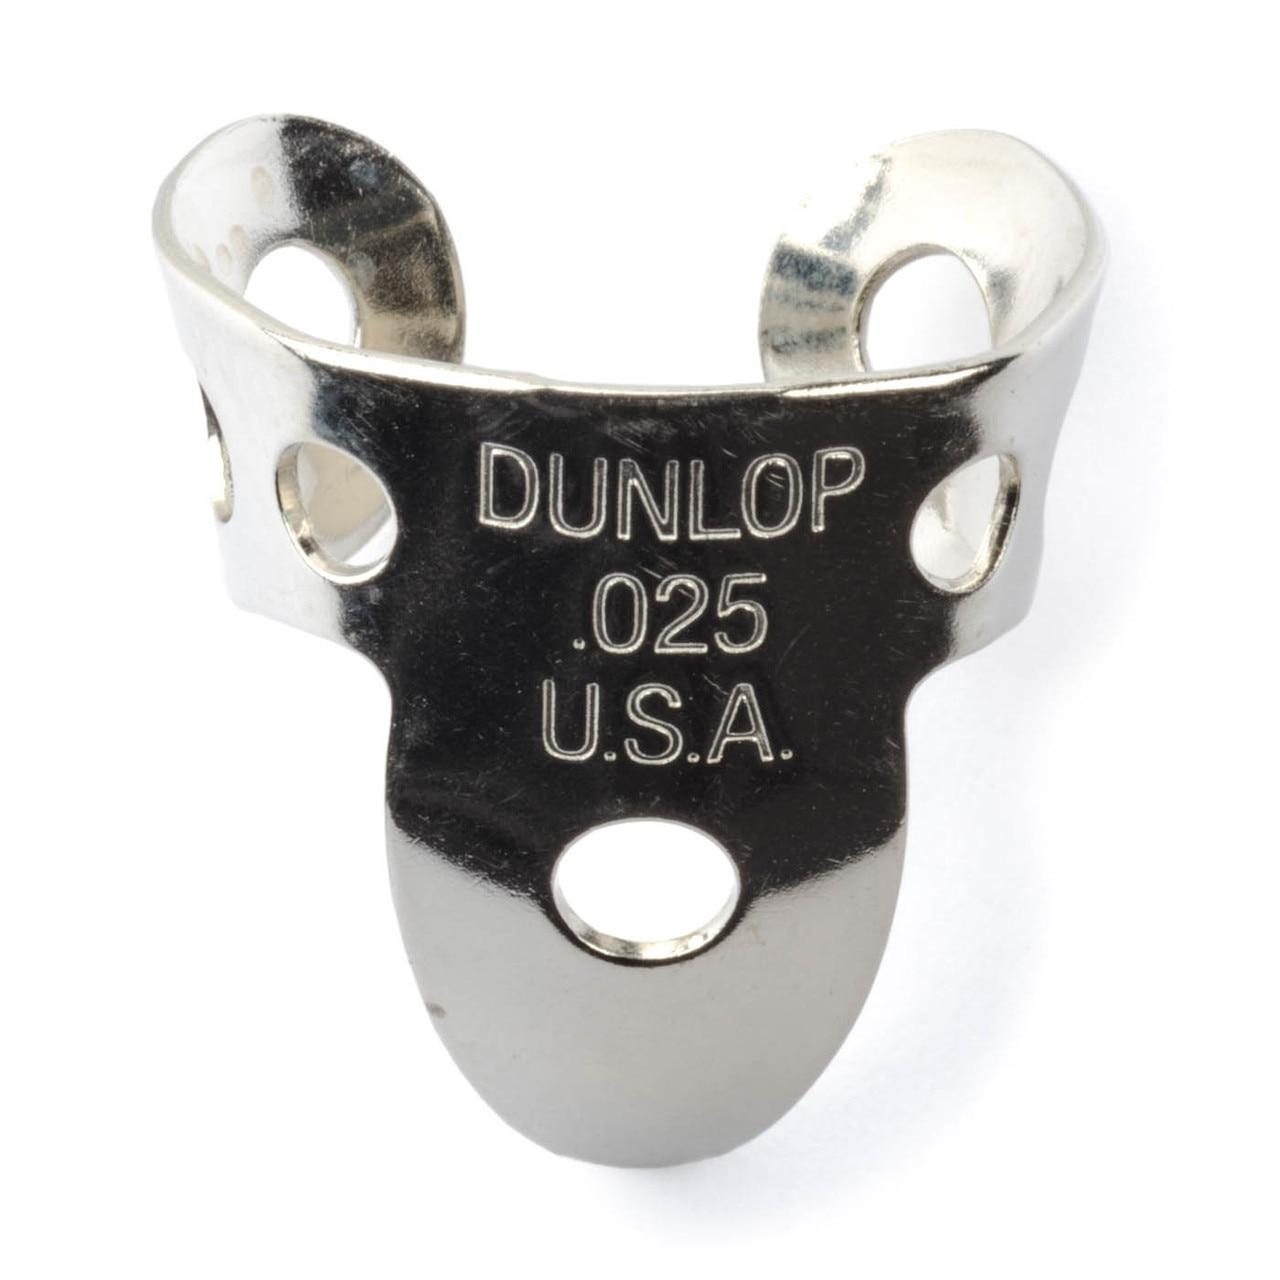 Dunlop 33P.025 5 Pack - Tommelfingerplekter